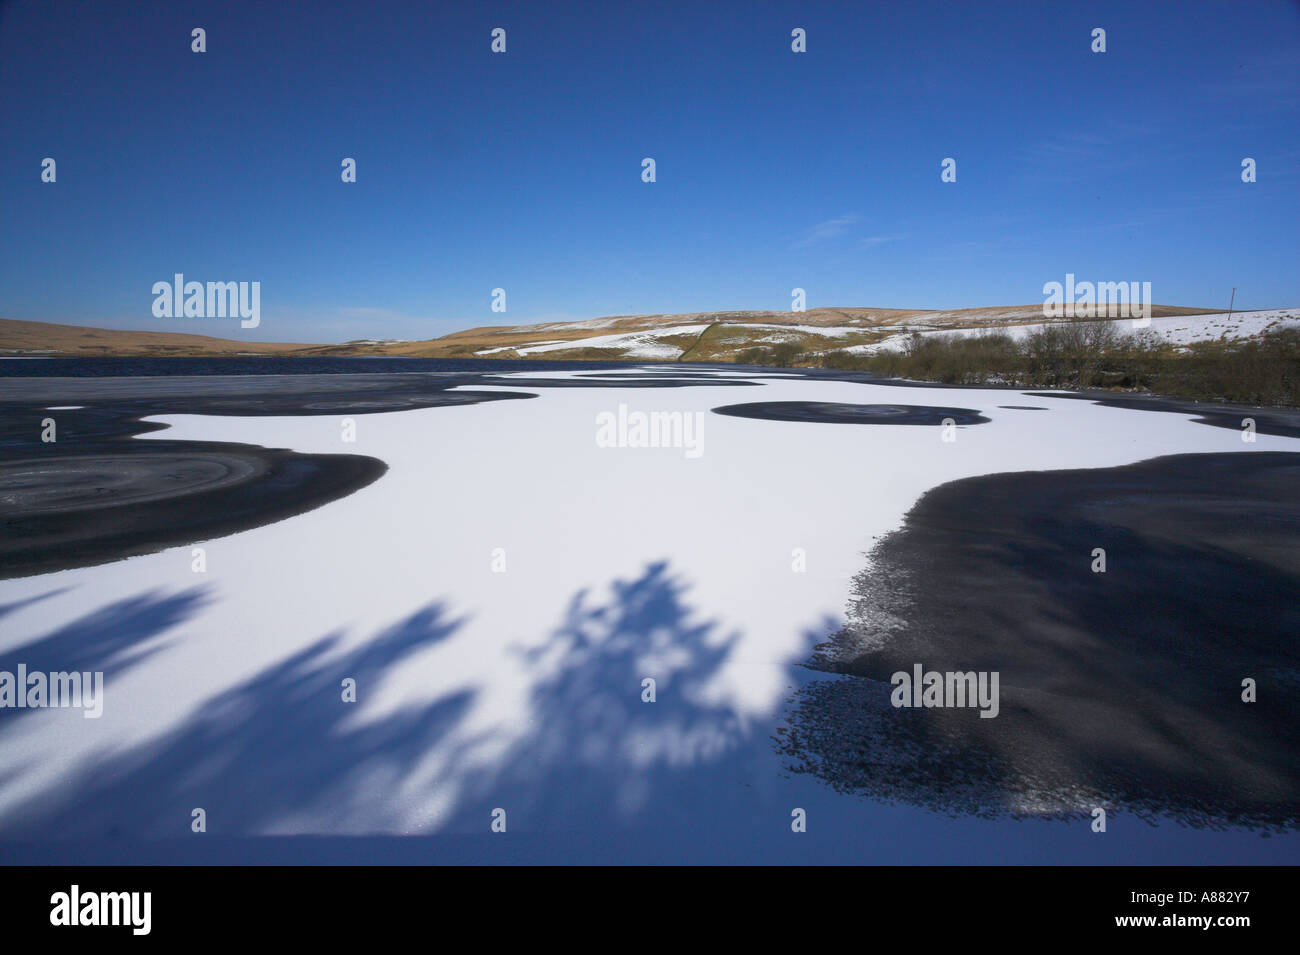 Belmont reservoir frozen in winter after snowfall Lancashire UK Stock Photo